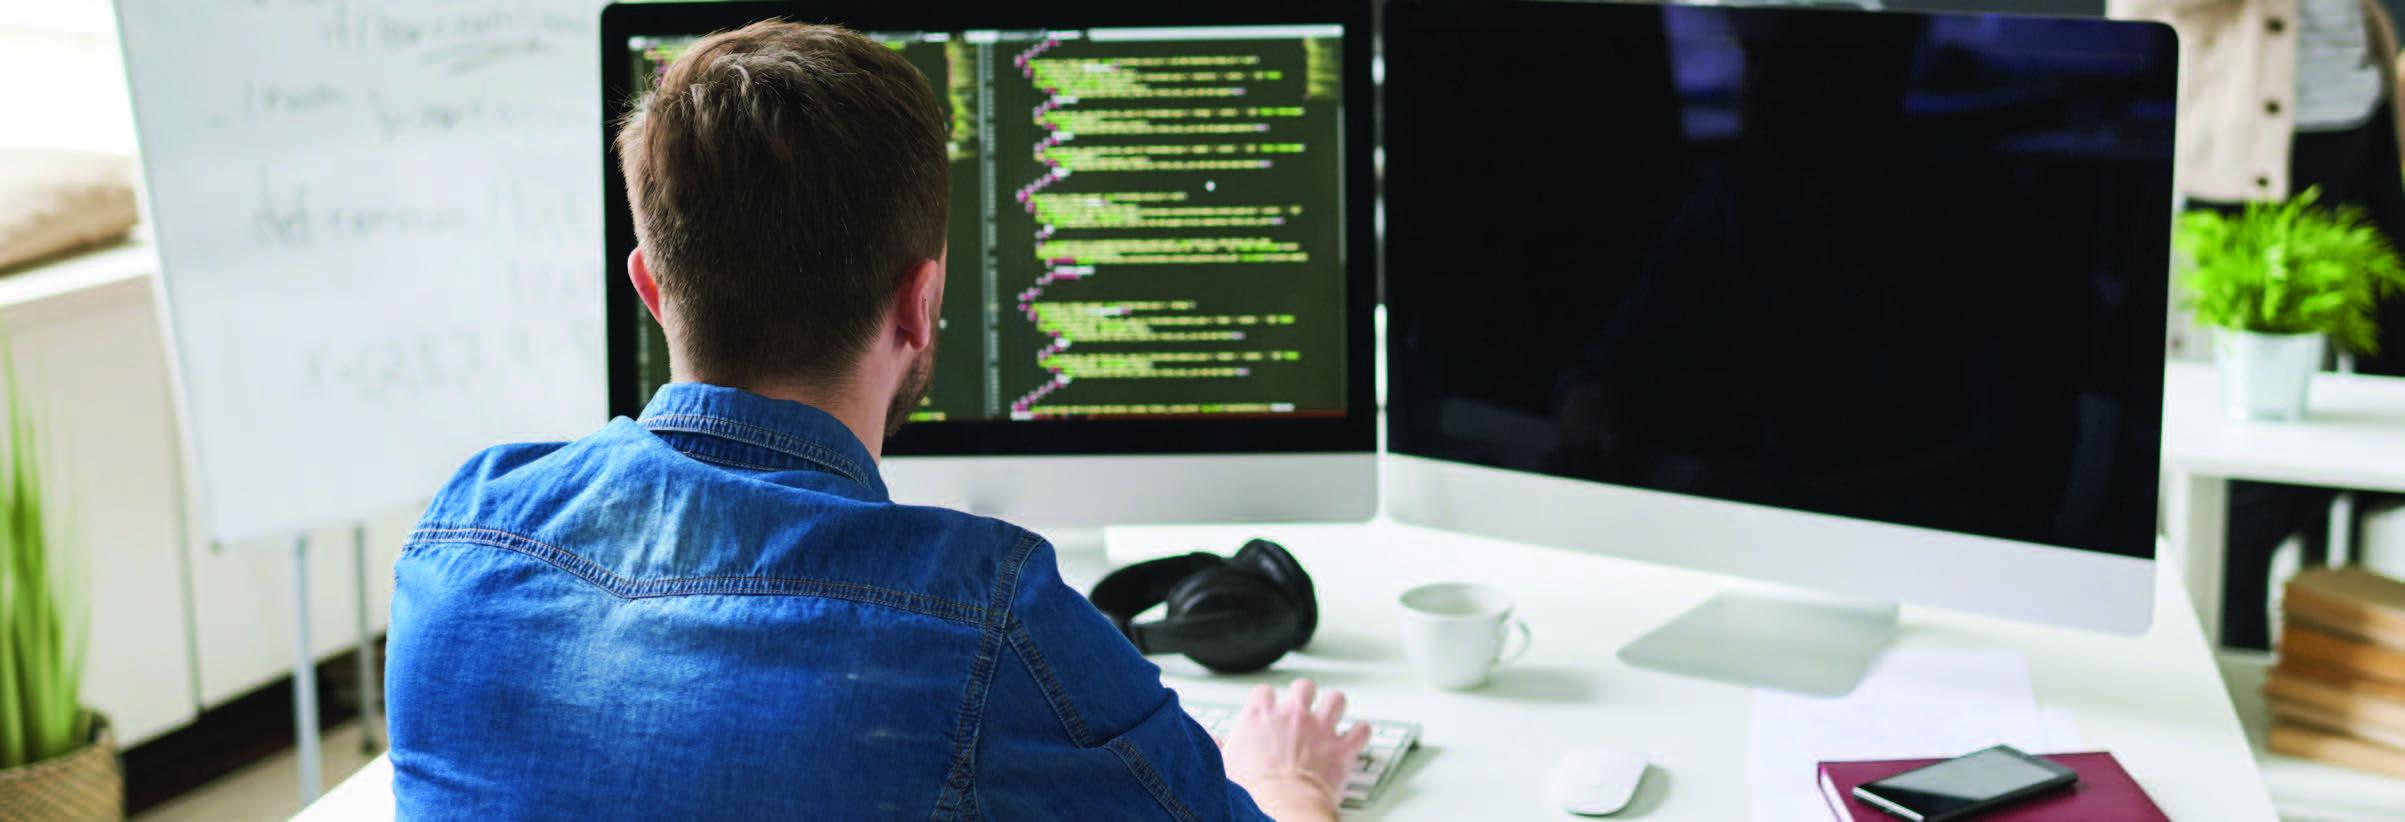 Web Development Certificate Image